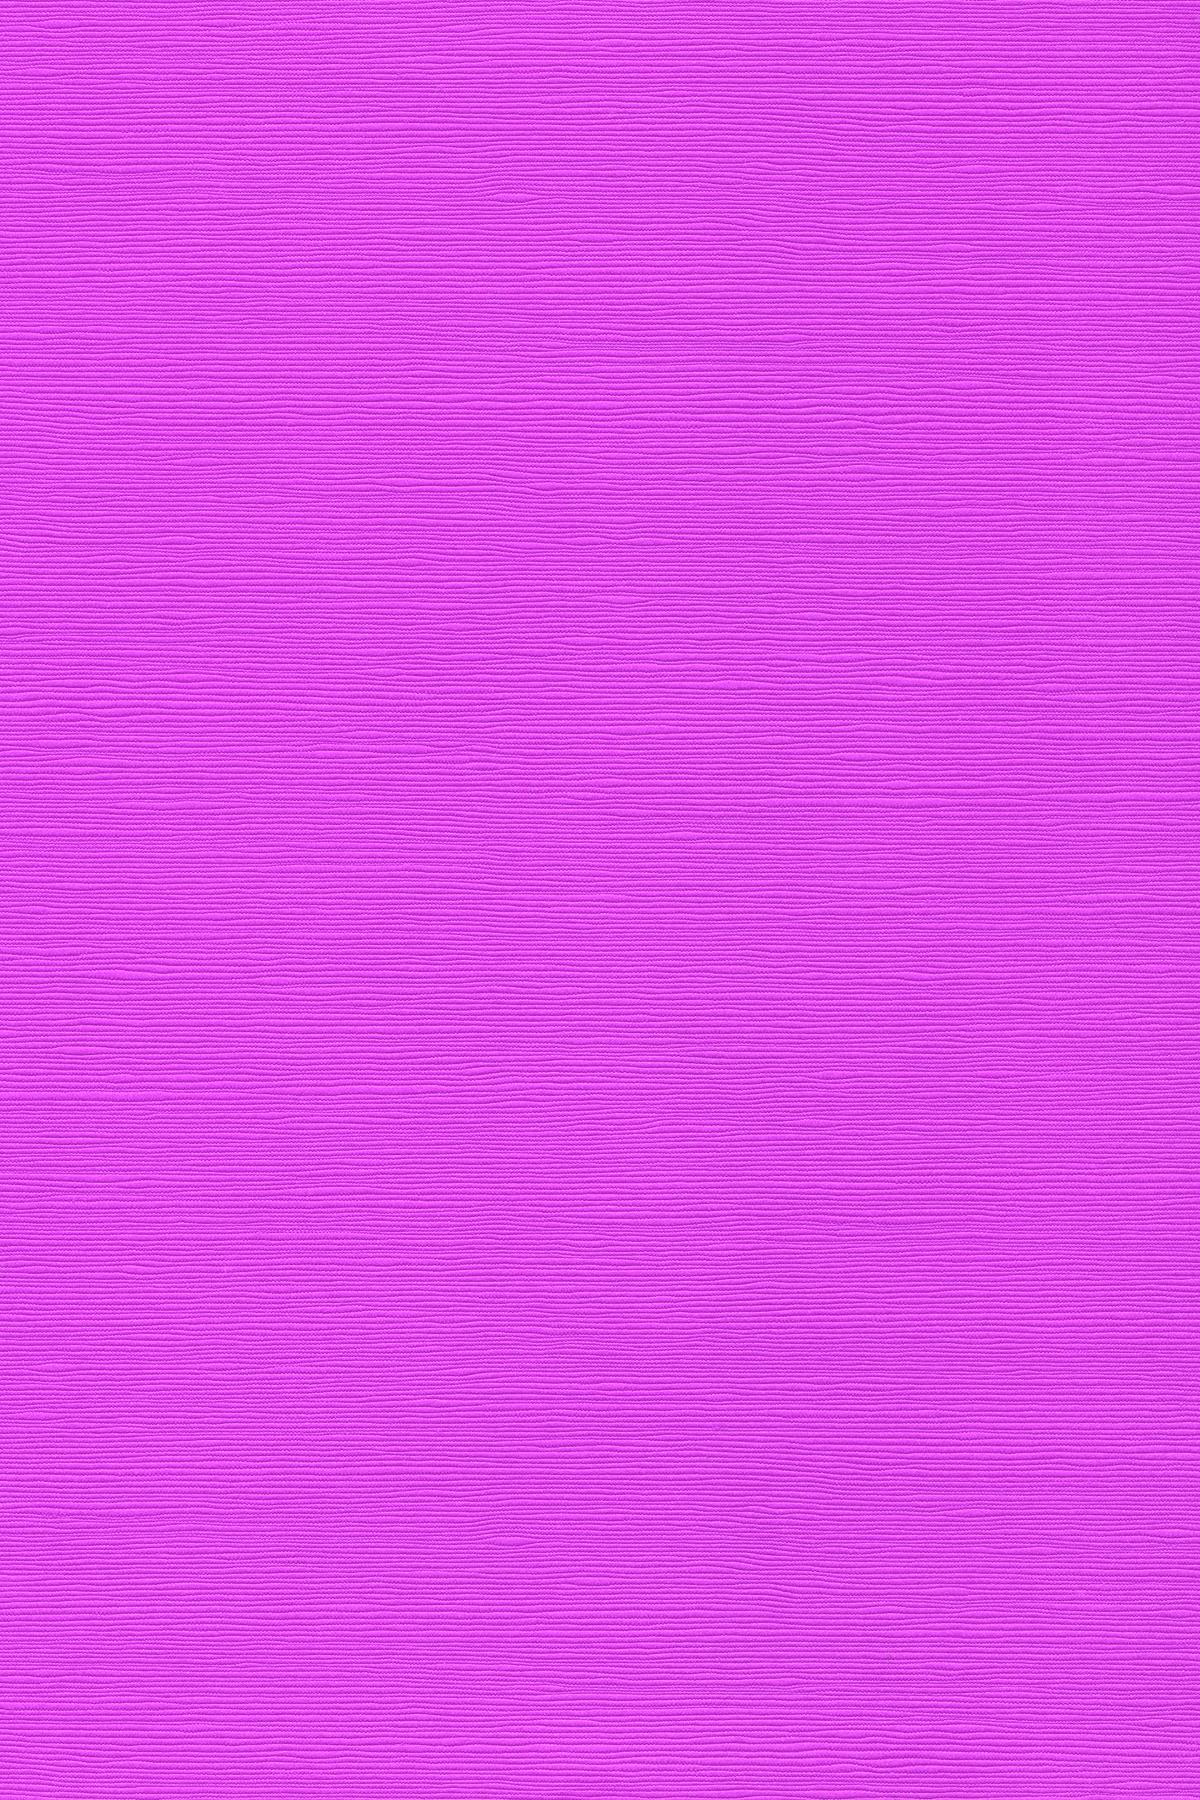 Japanese linen paper - pink photo